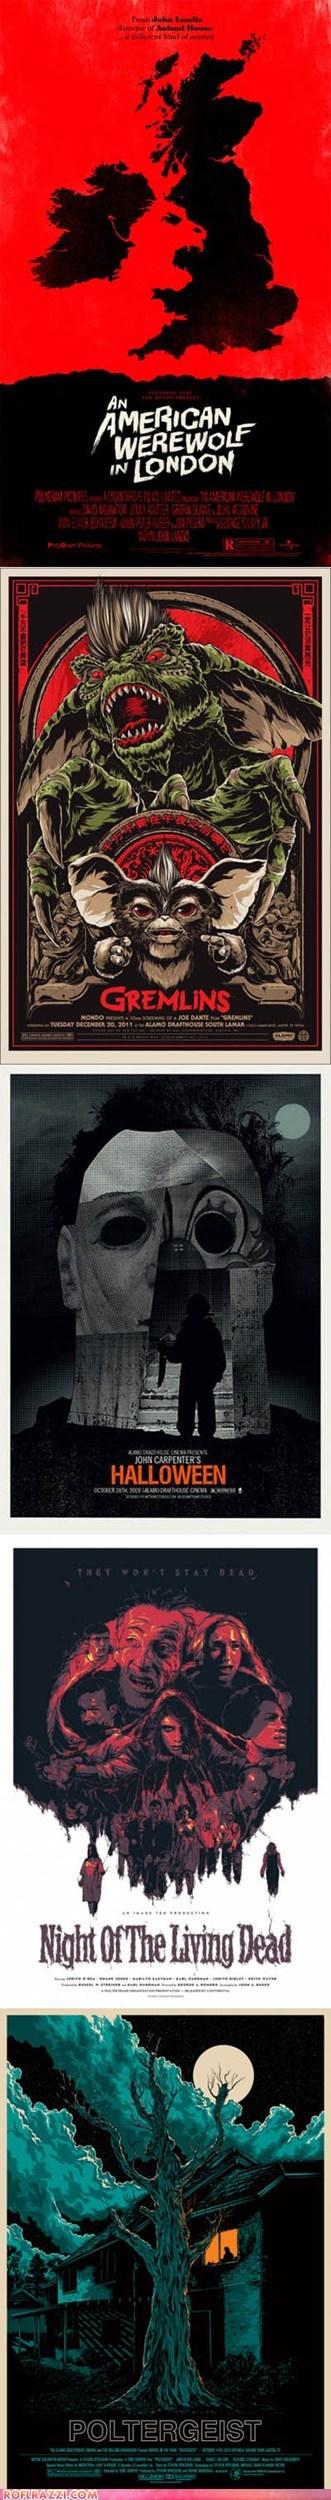 Creepy Alternate Reality Movie Posters